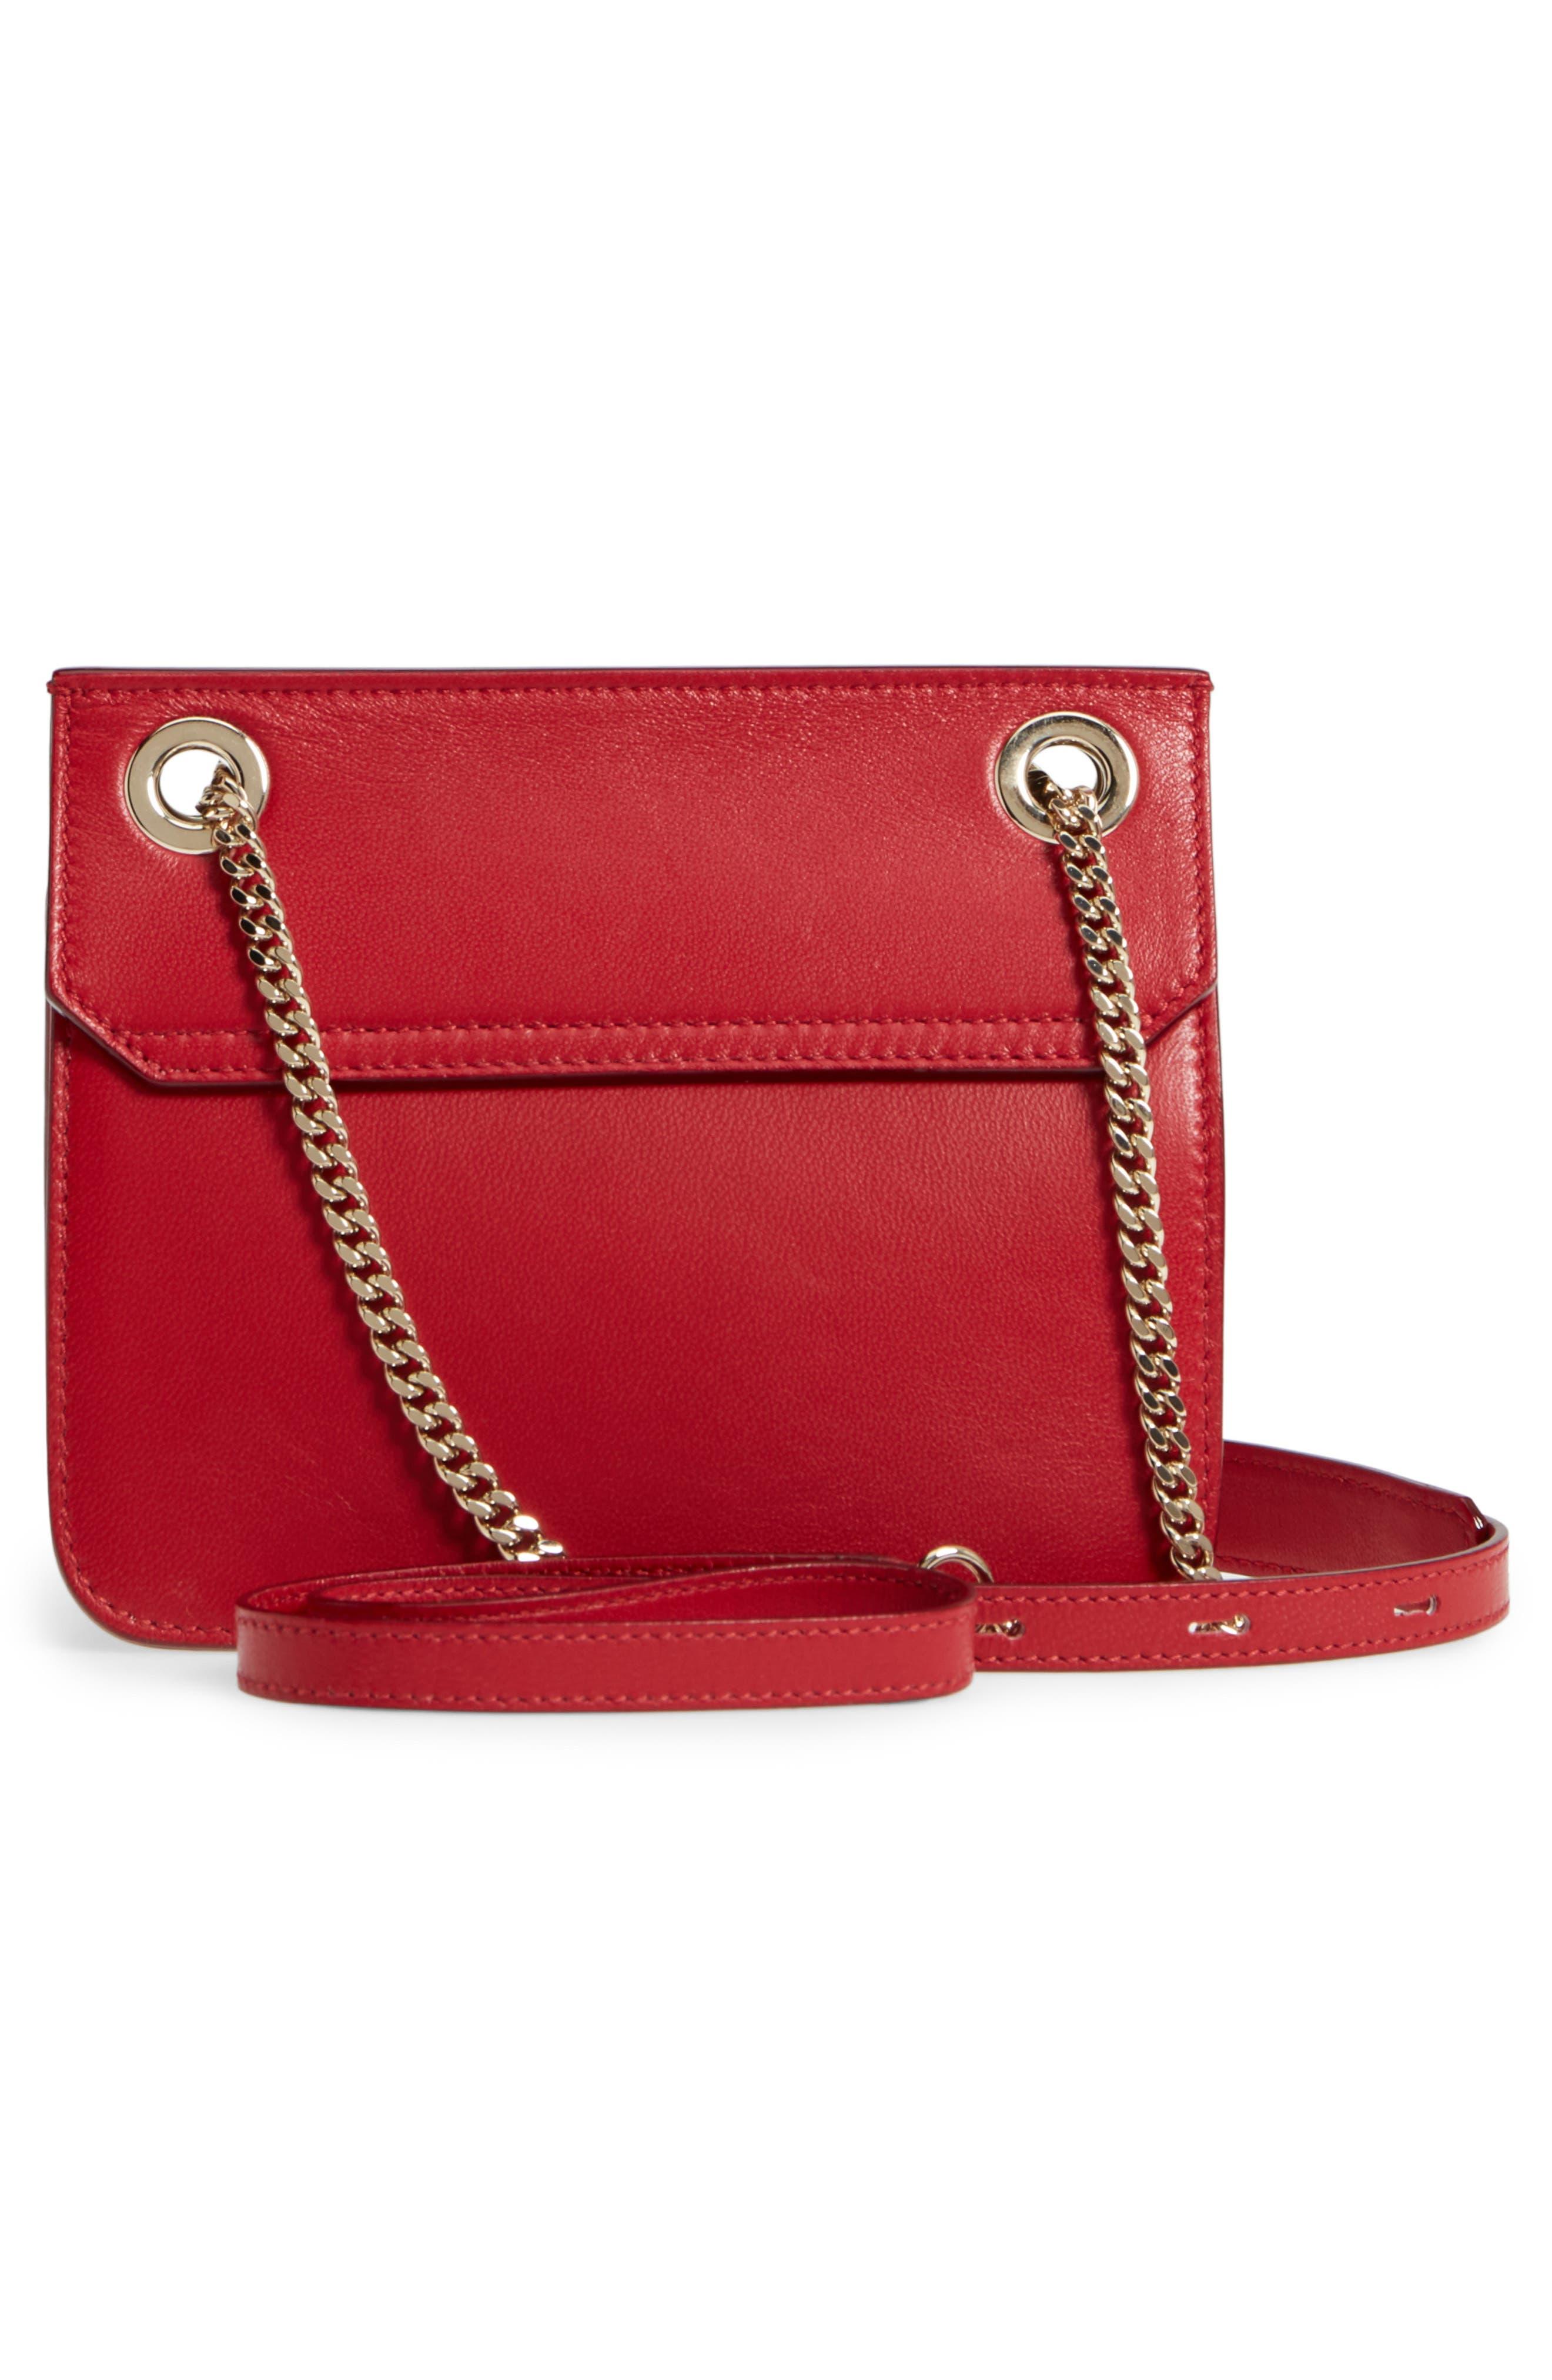 Rebel Mini Colorblock Leather Crossbody Bag,                             Alternate thumbnail 3, color,                             600